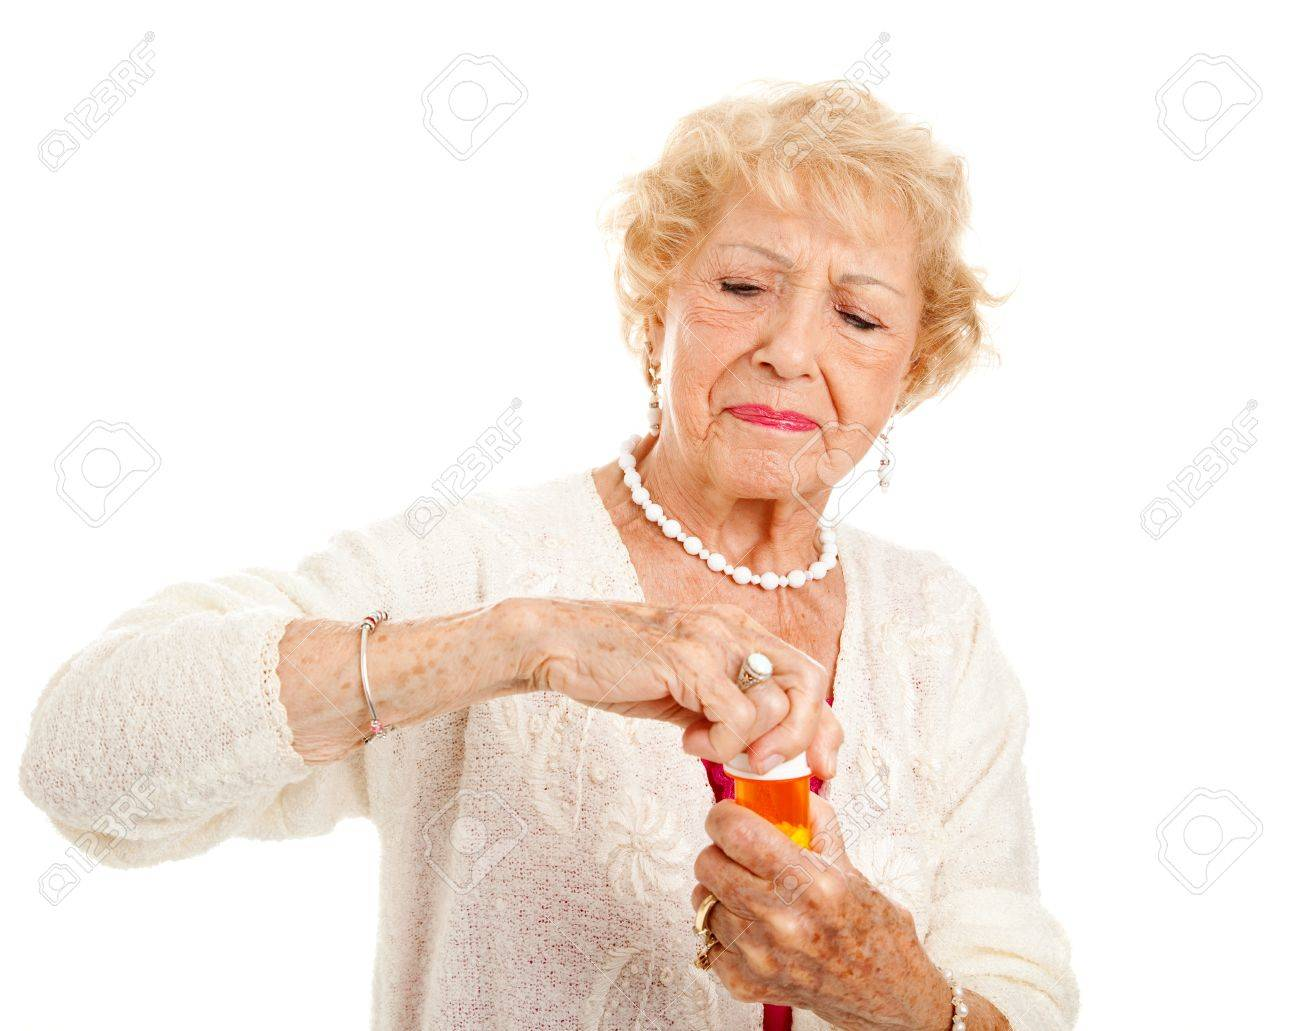 Senior woman with arthritis struggles to open a bottle of prescription medication. Stock Photo - 10104132